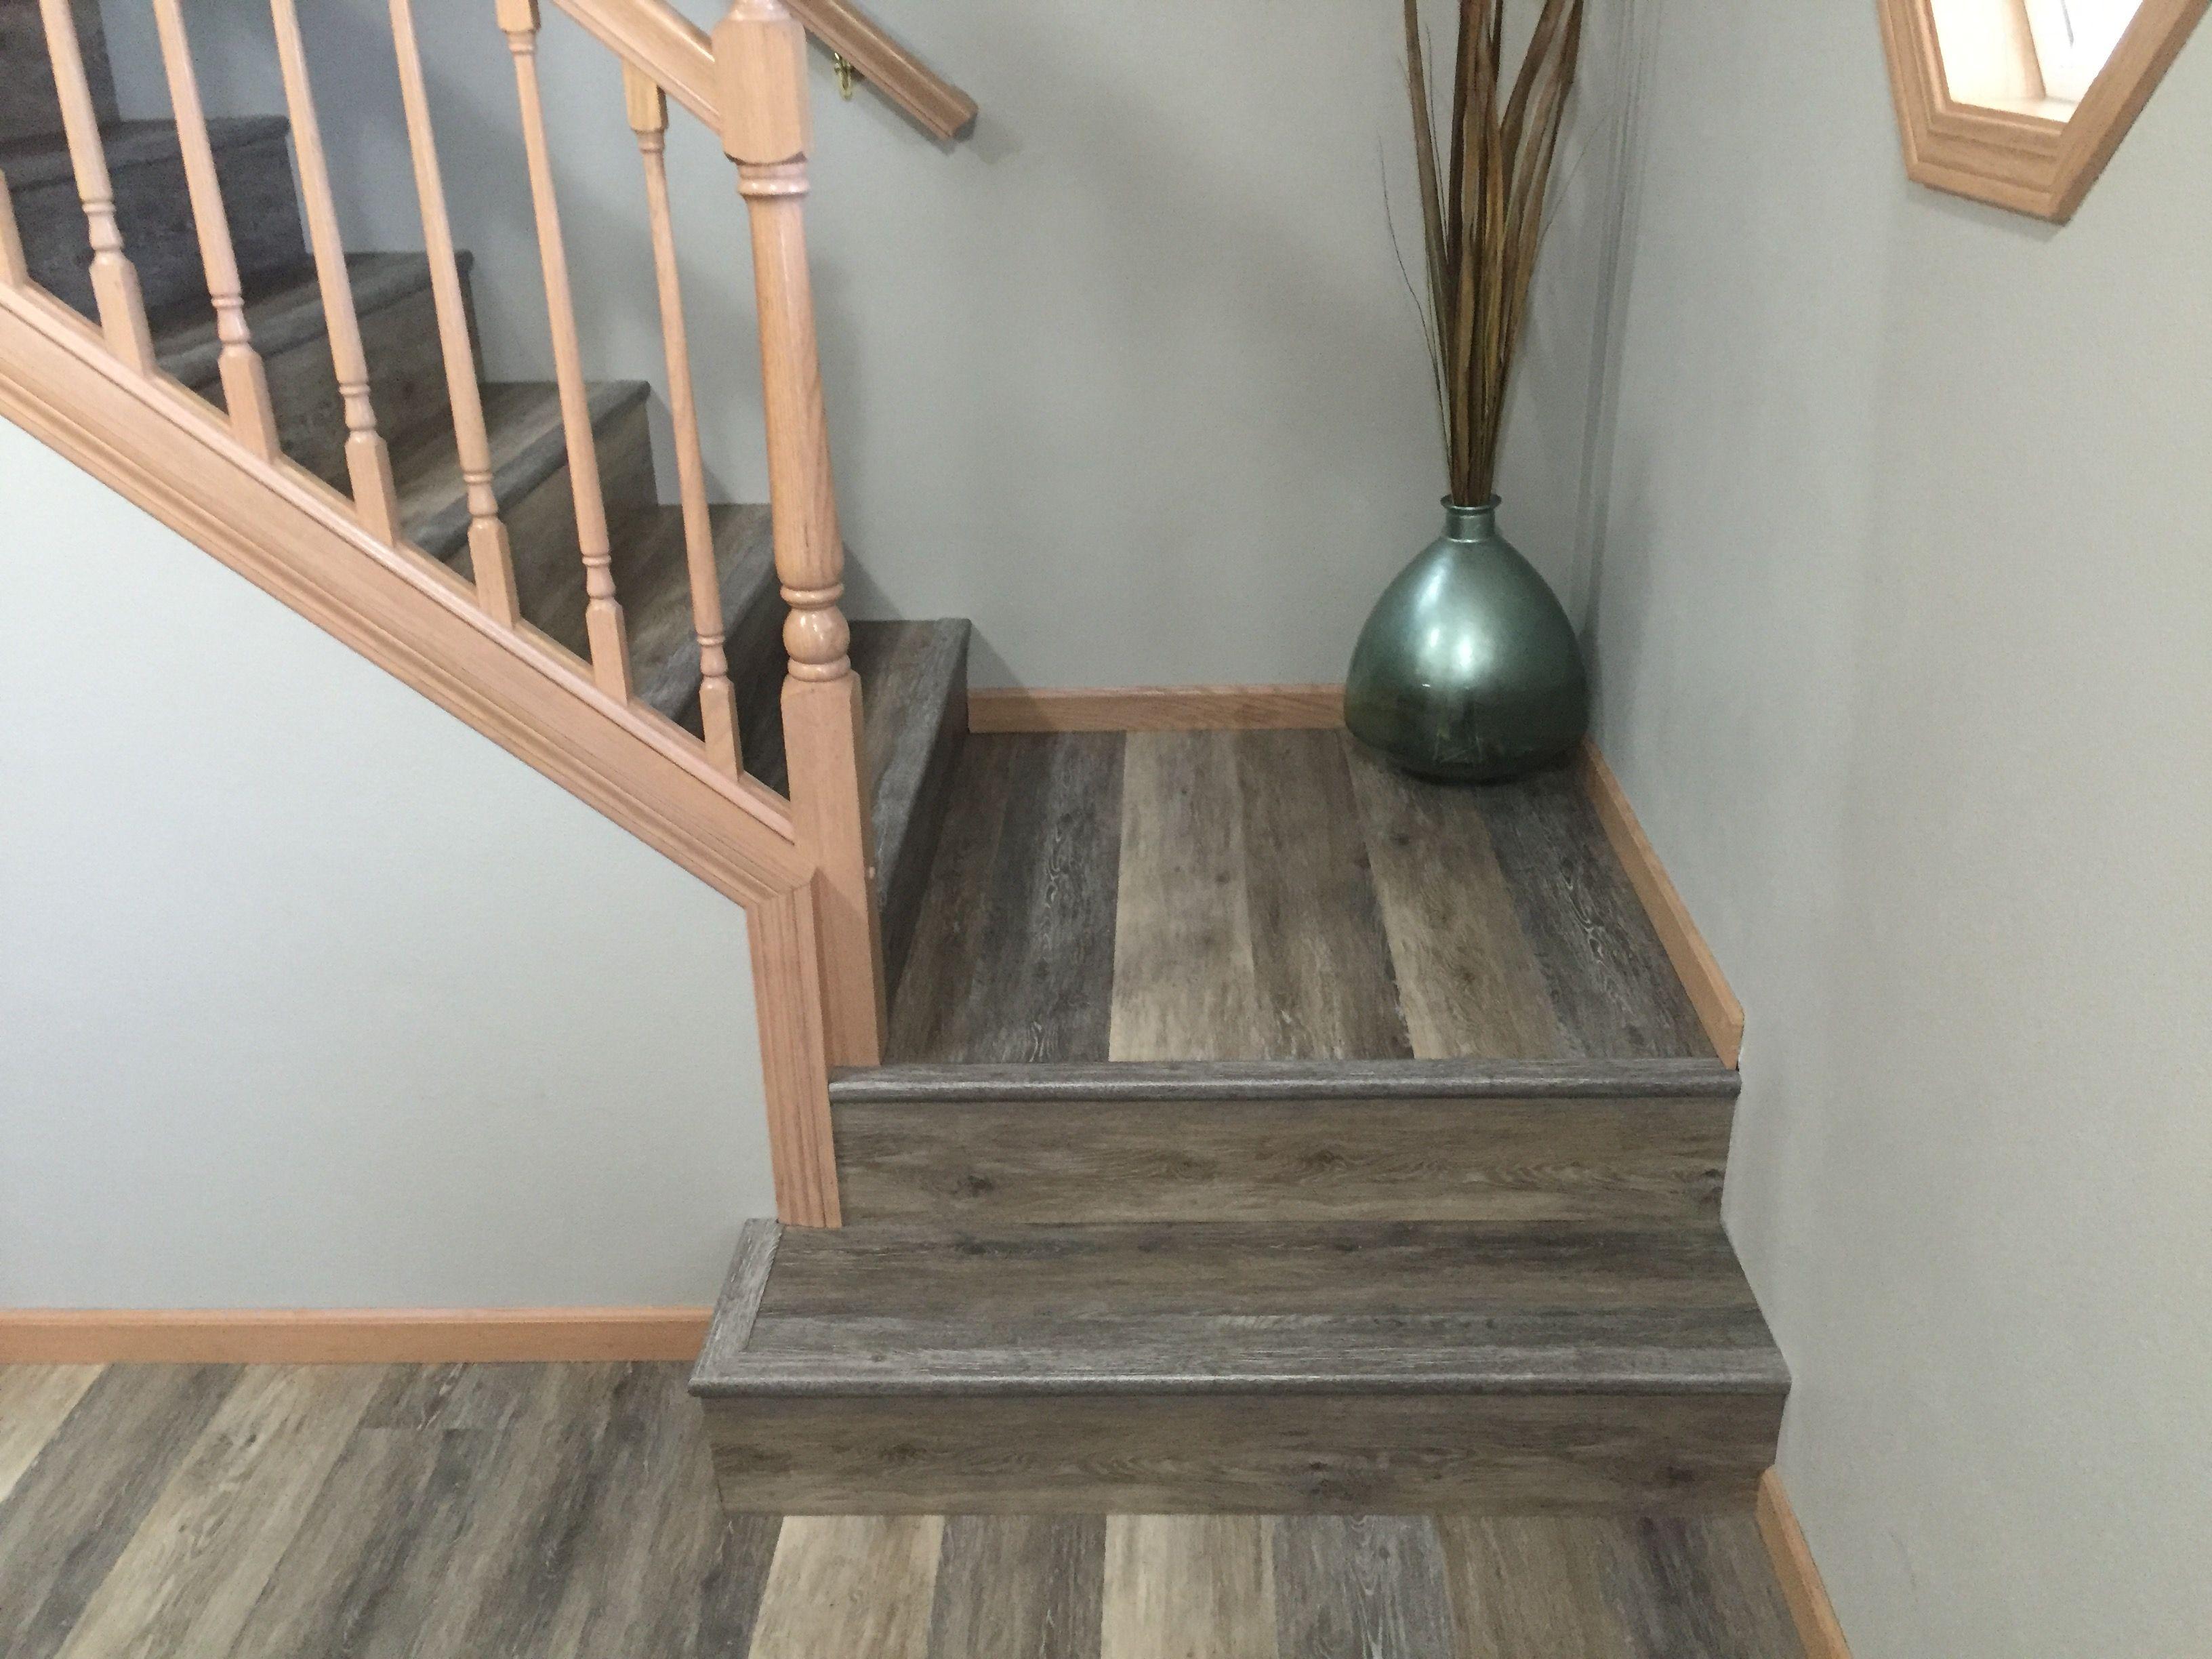 Blackstone Oak Stair Nose Overlap Oak Stairs Stairs Coretec